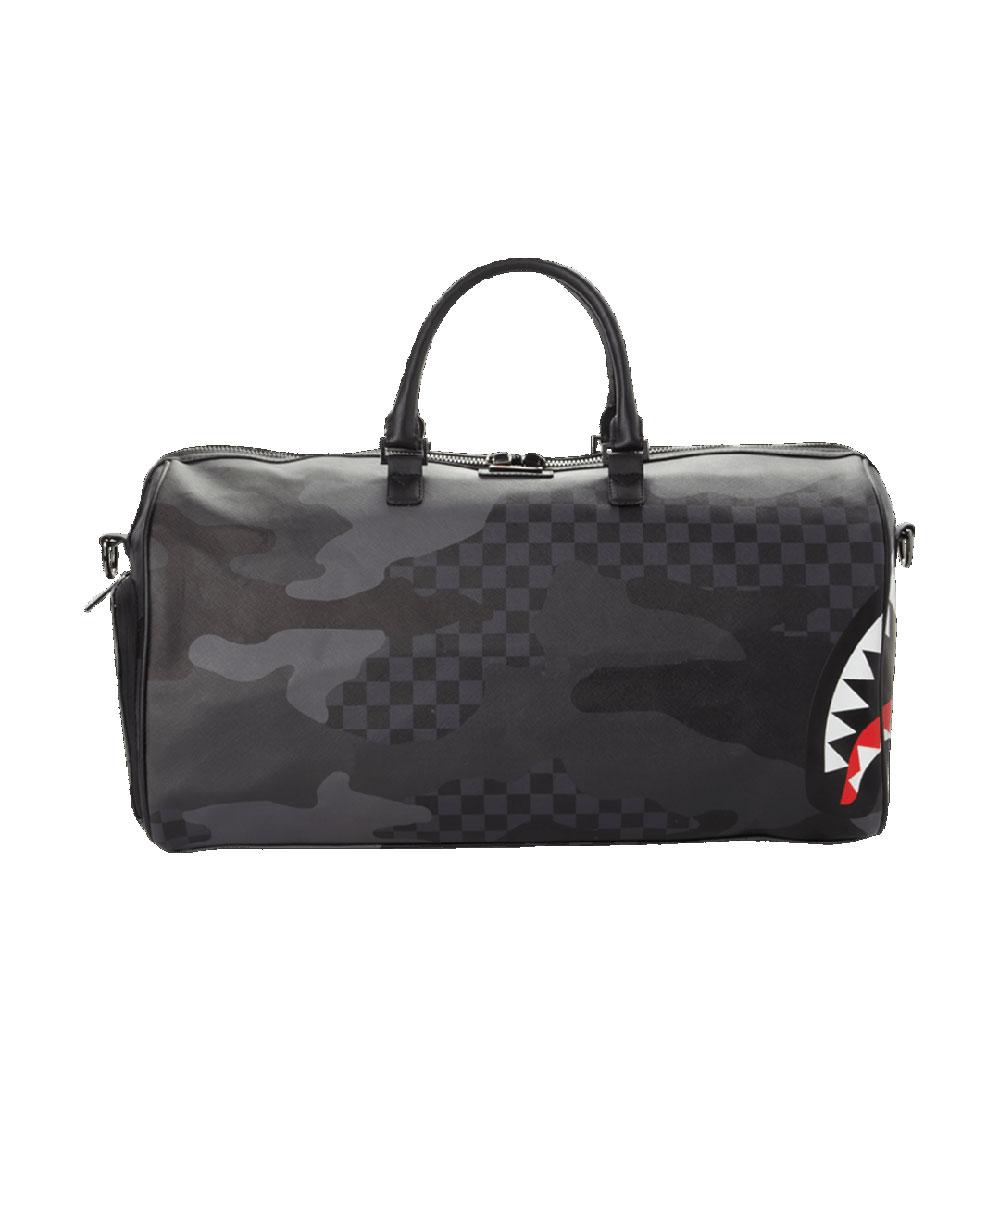 3am Duffle Bag